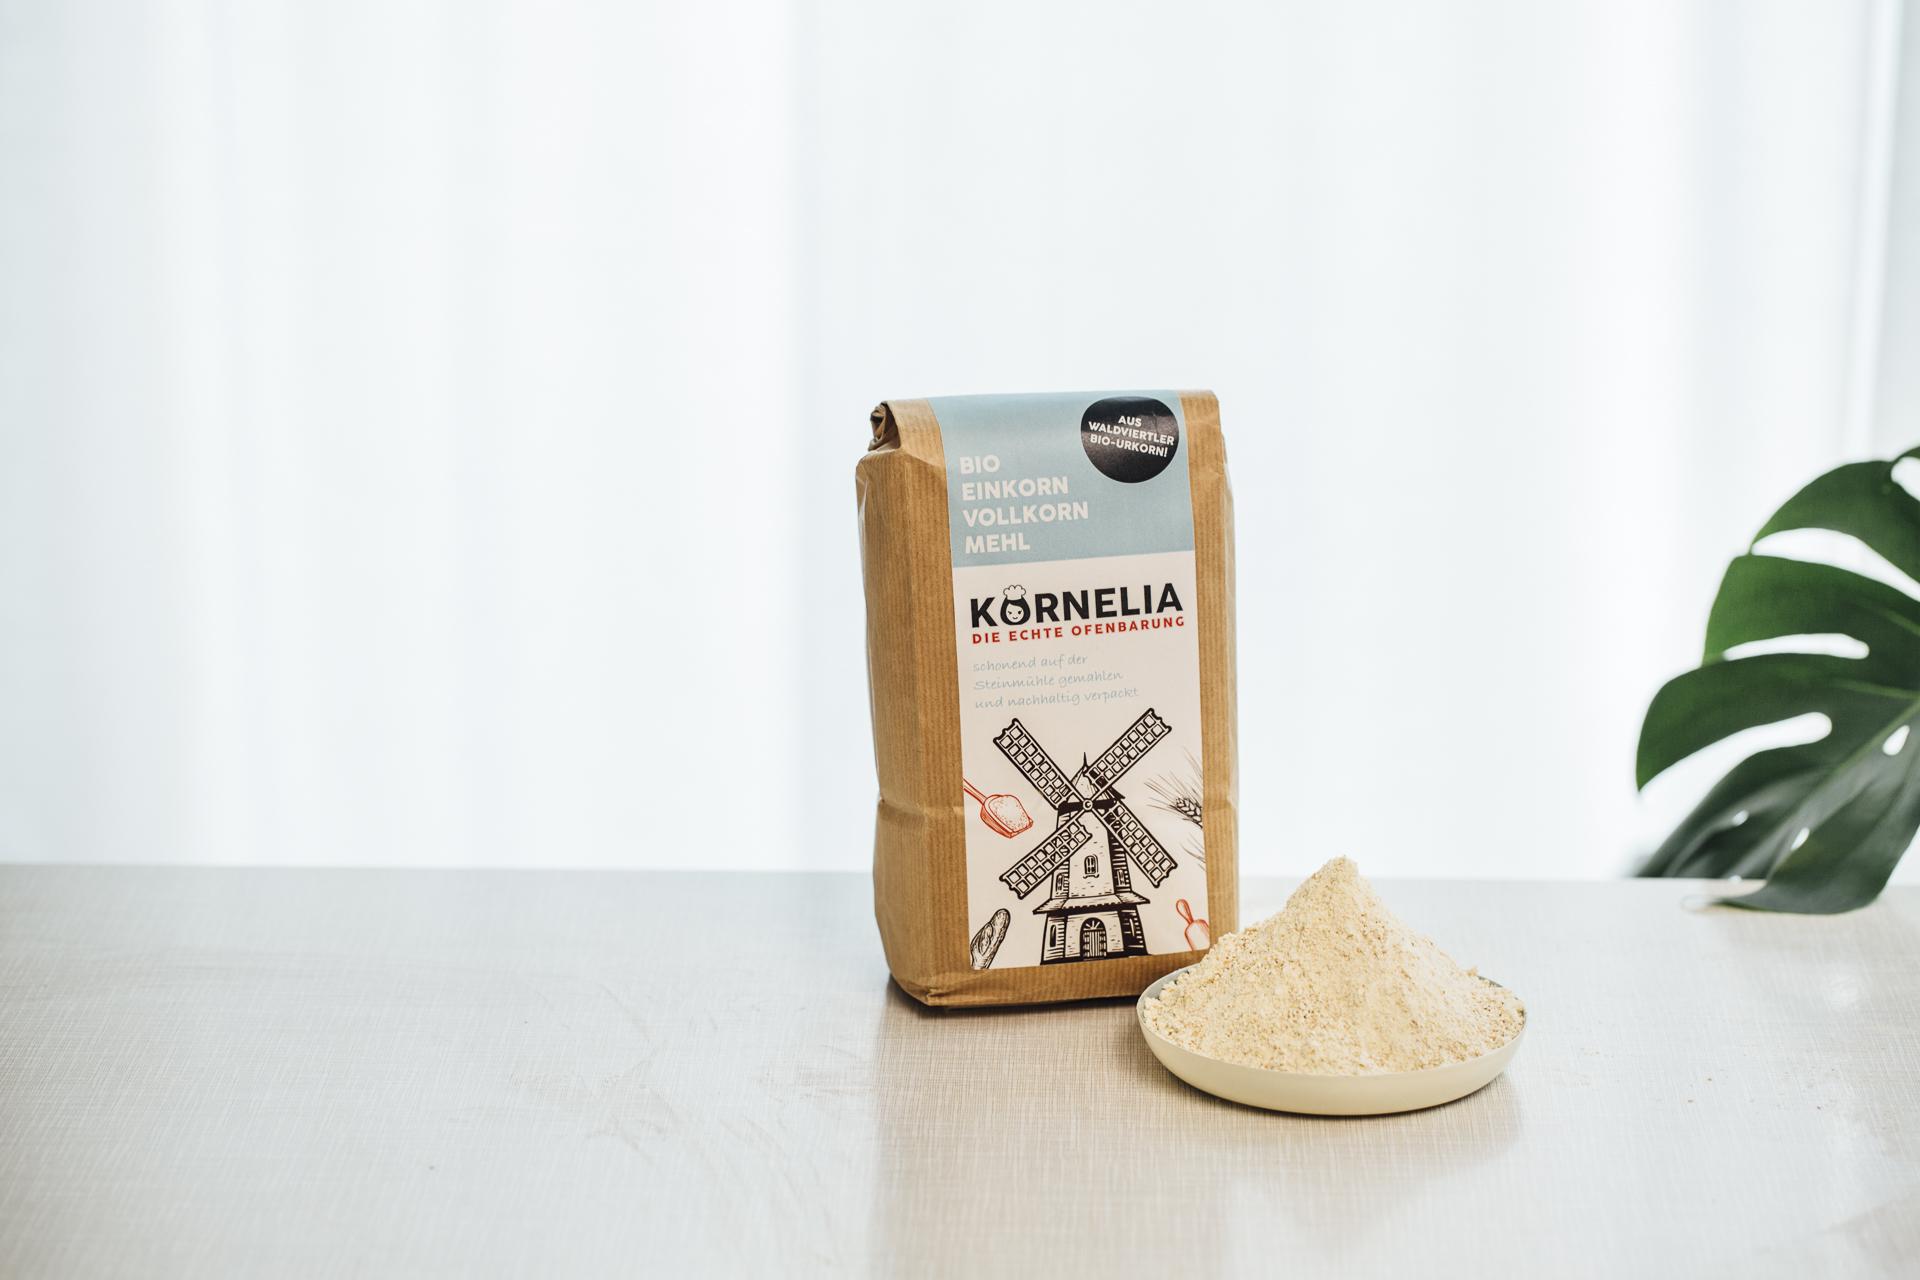 https://kornelia-urkorn.at/wp-content/uploads/2019/10/MH_20191126_KORNELIA_Produktshooting_lores_0021.jpg